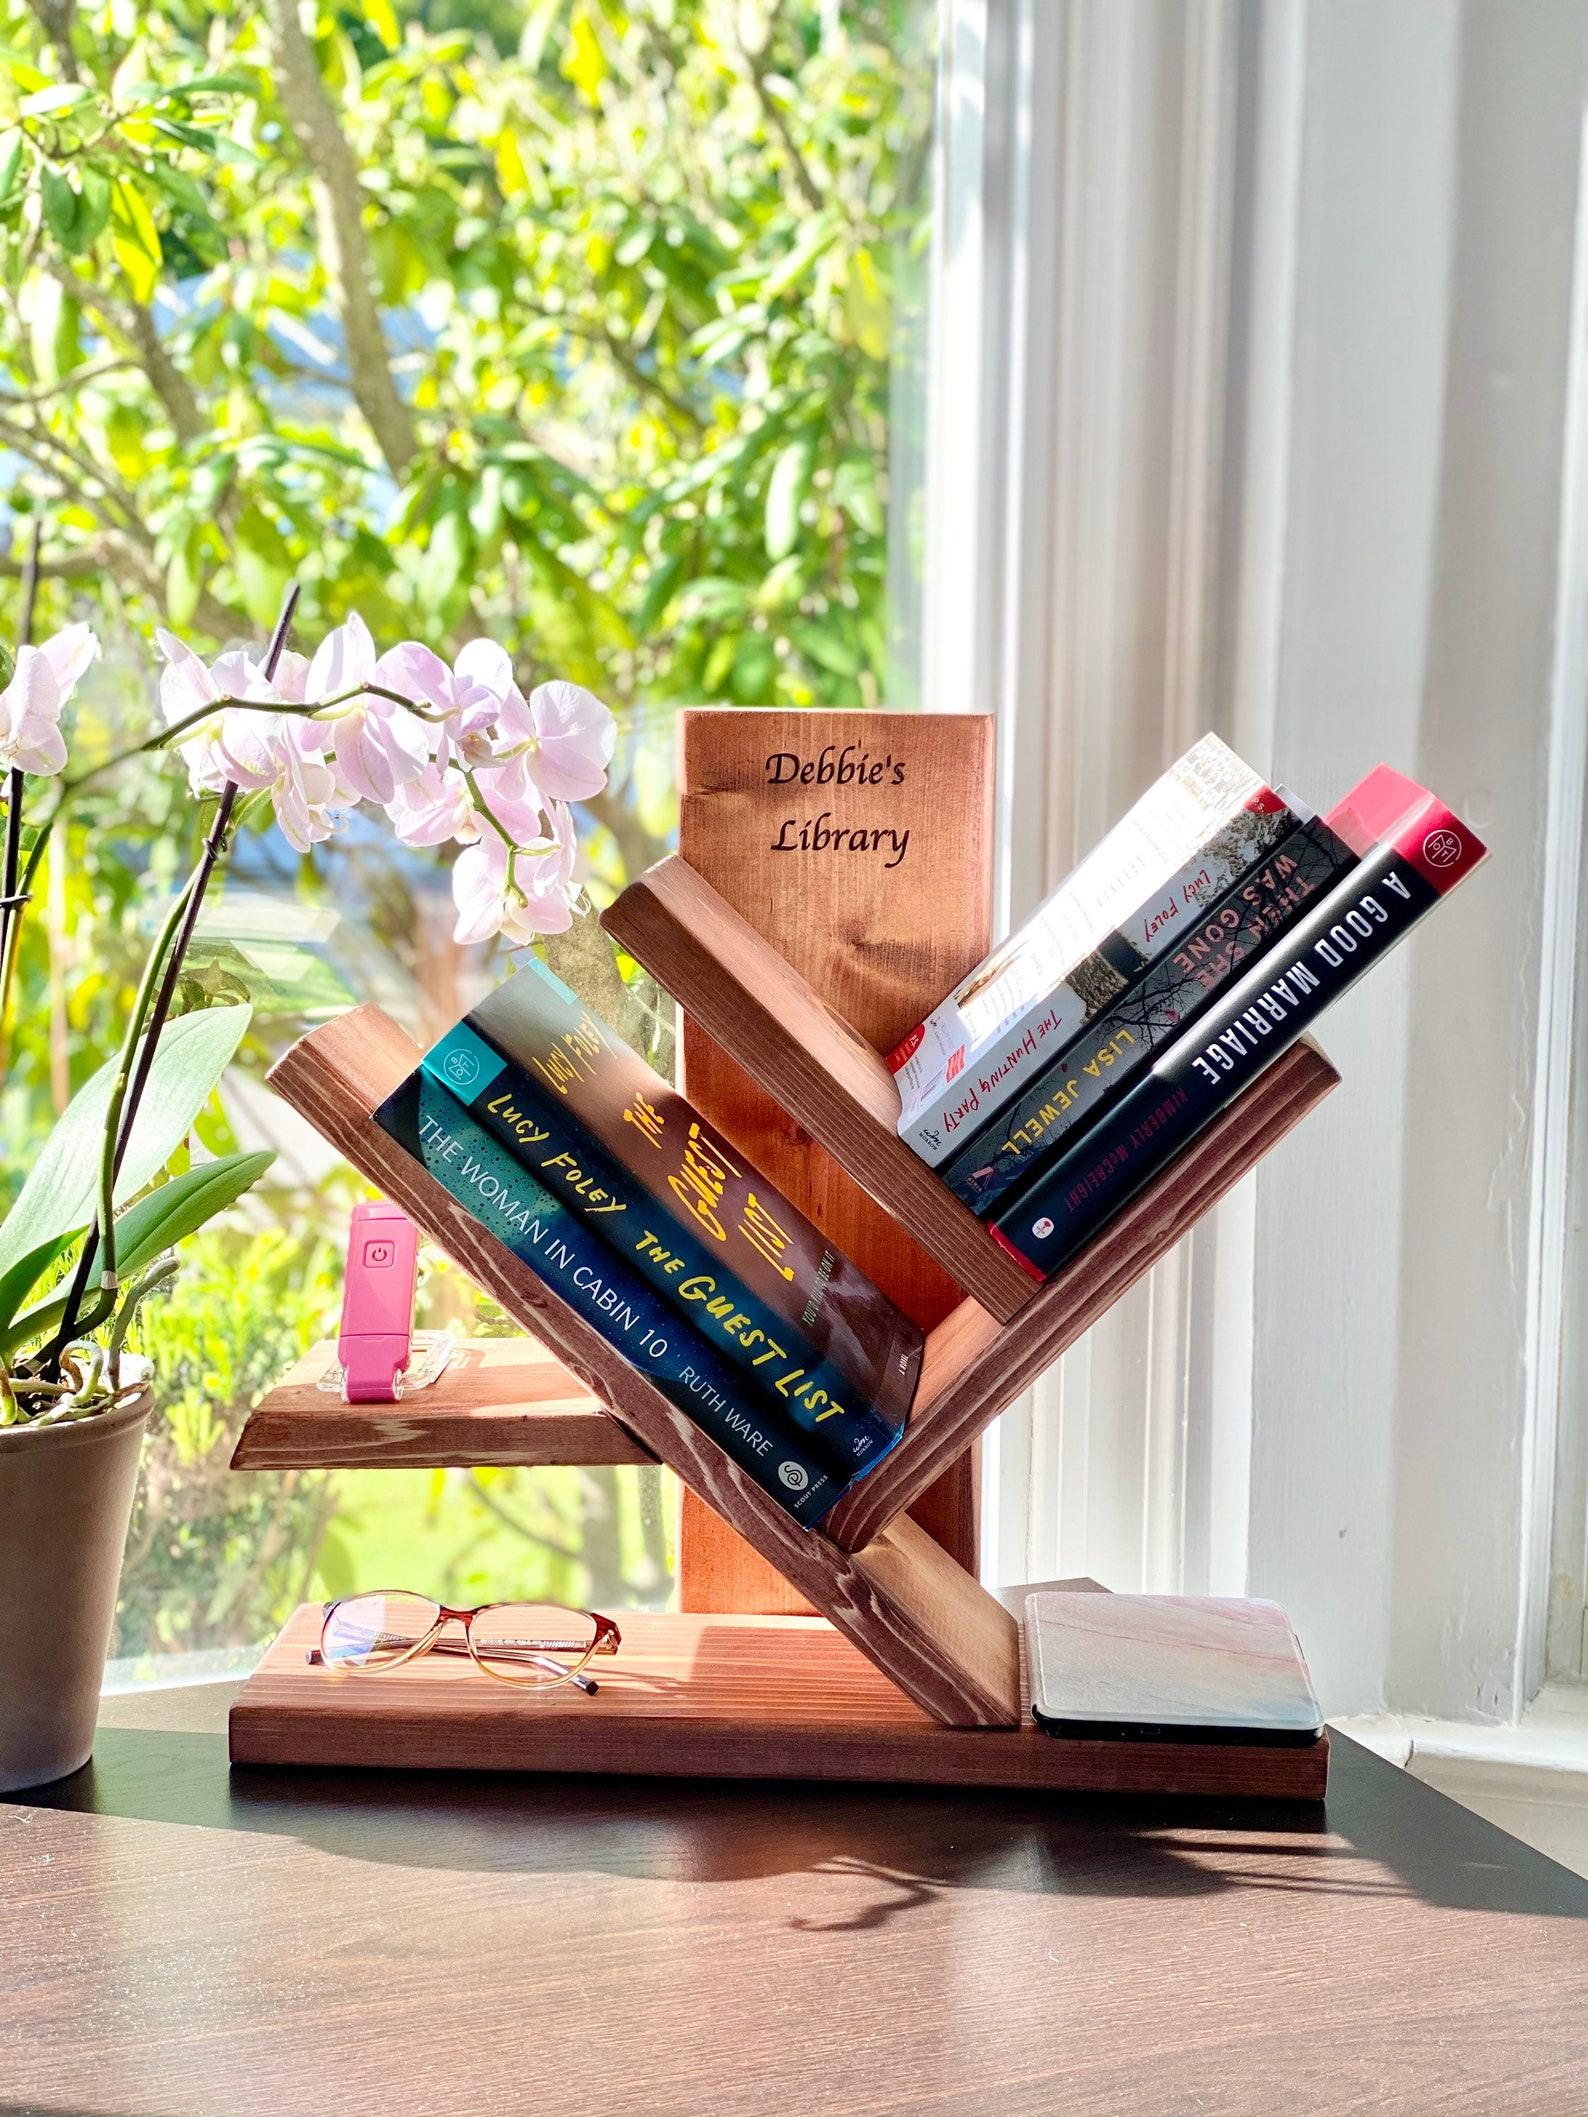 Tabletop bookshelf